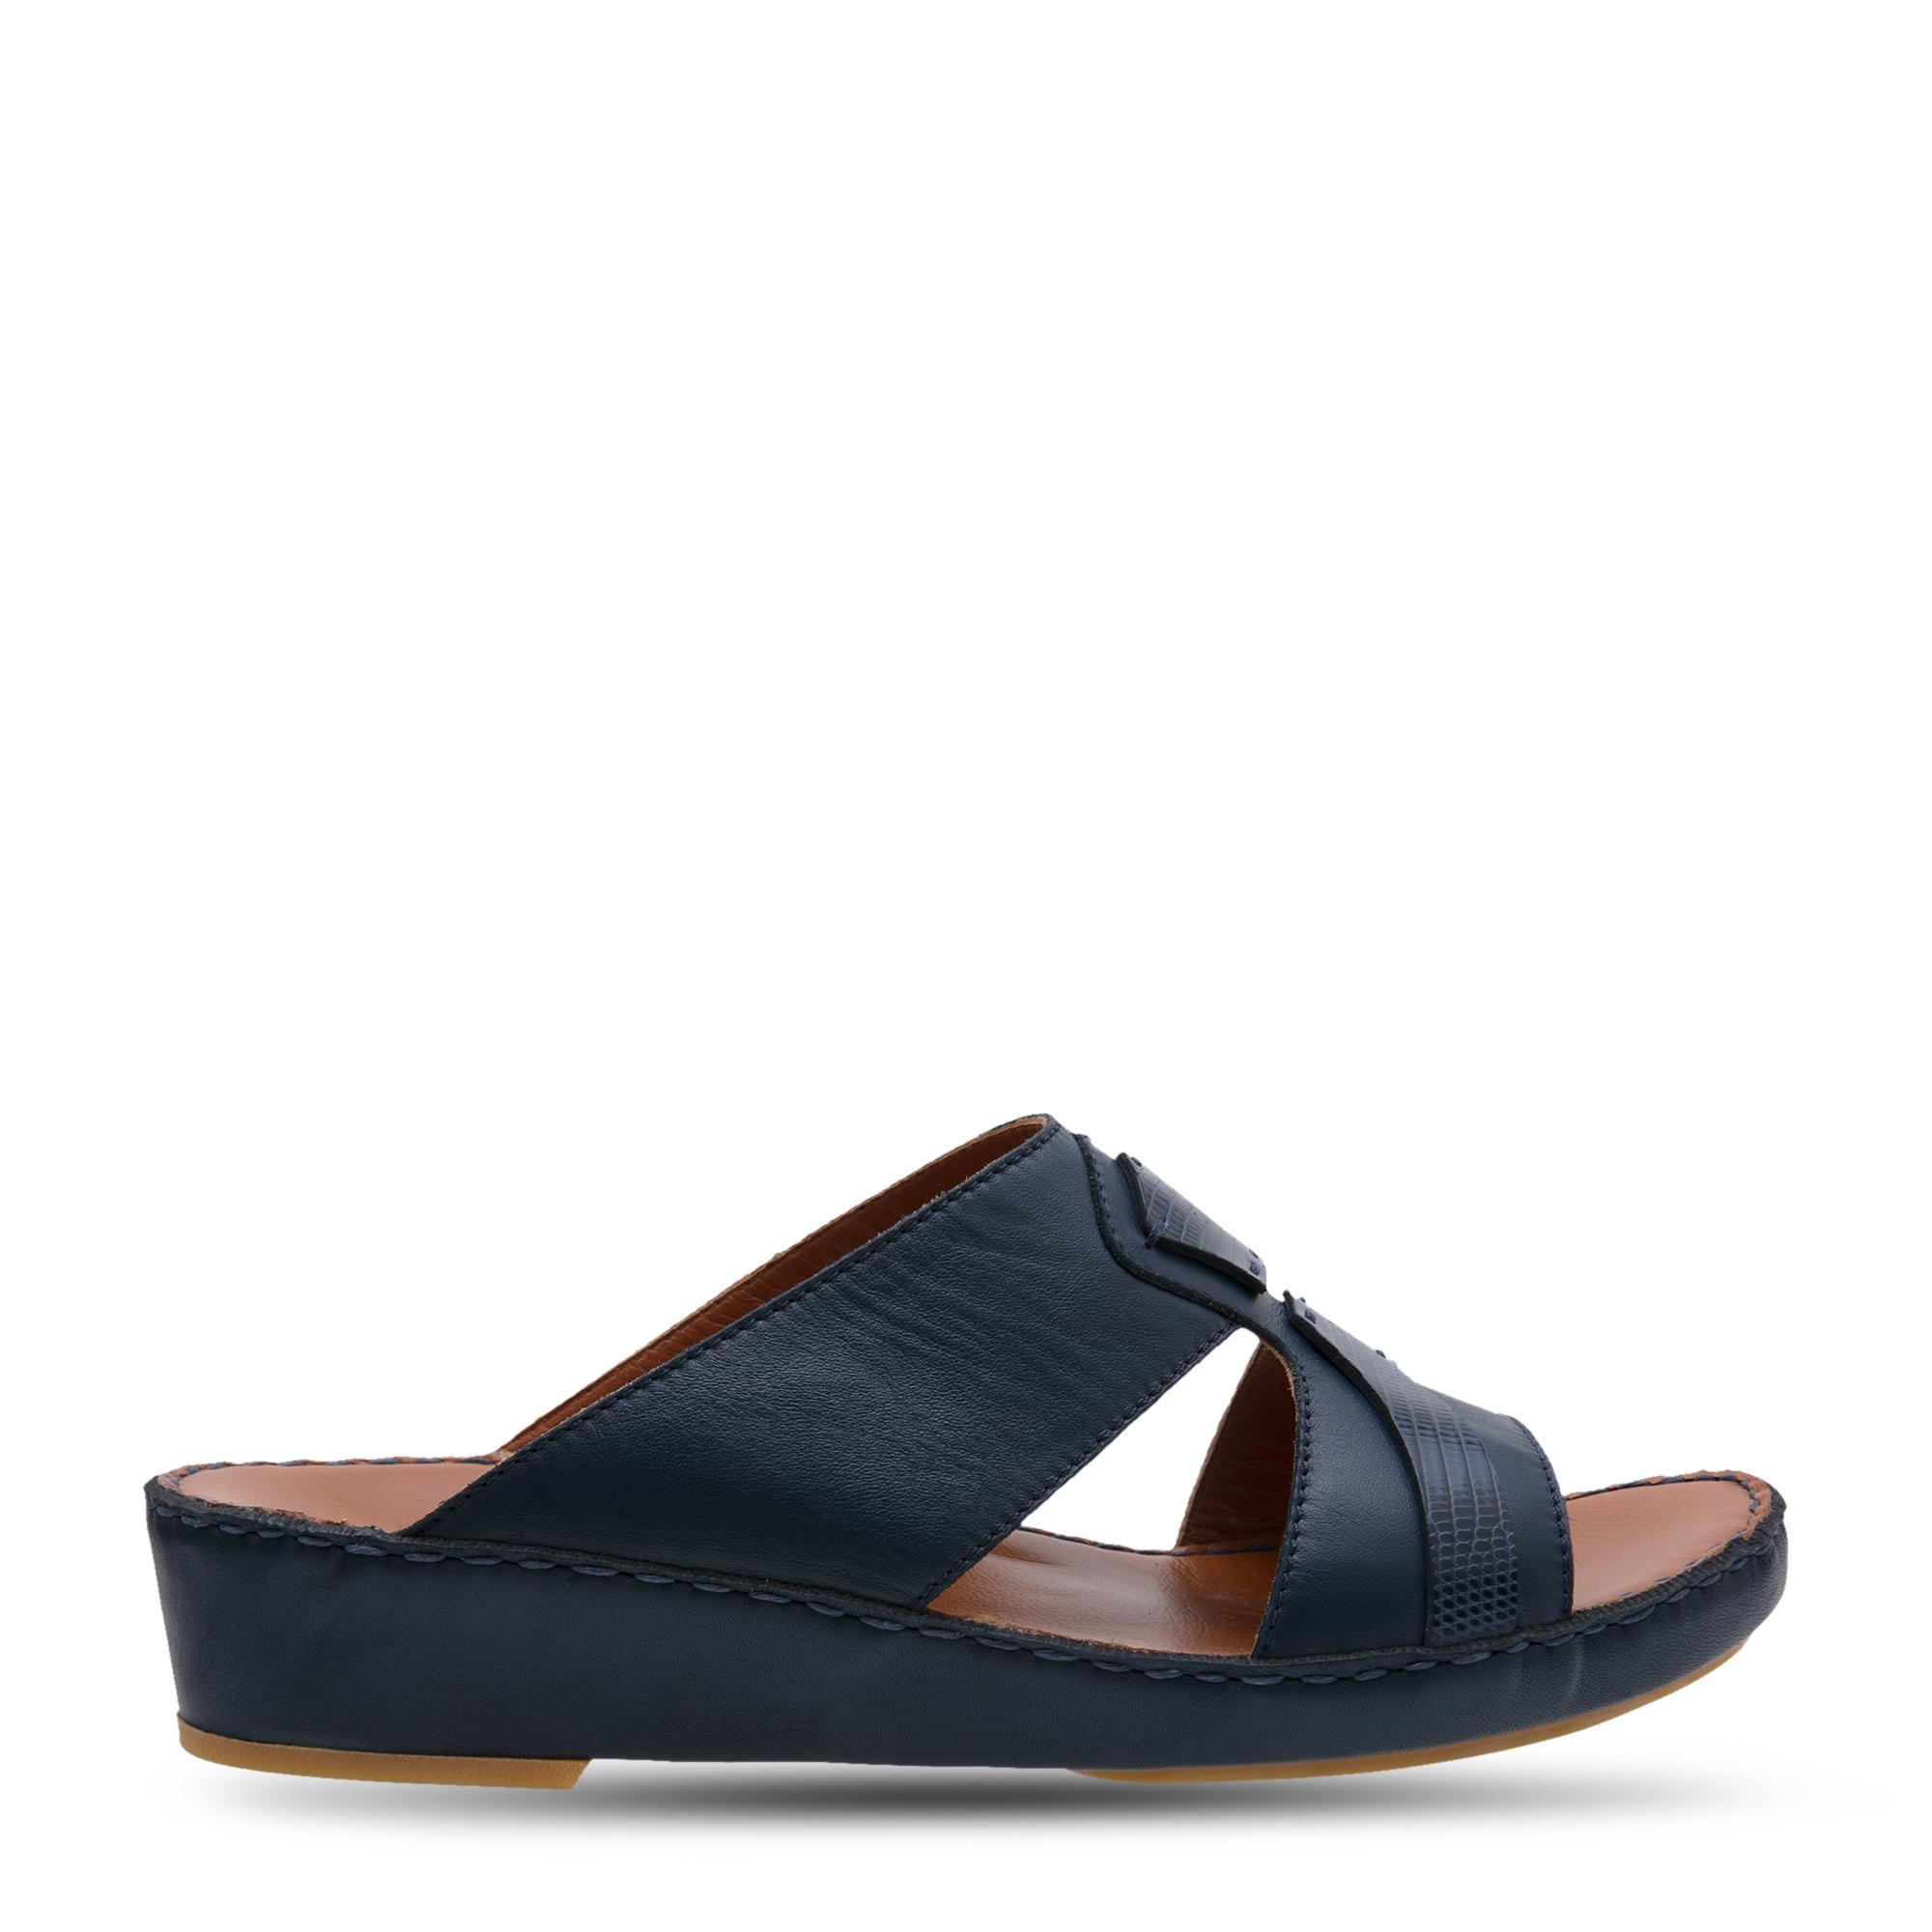 Peninsula Soft Calf Saddle sandals